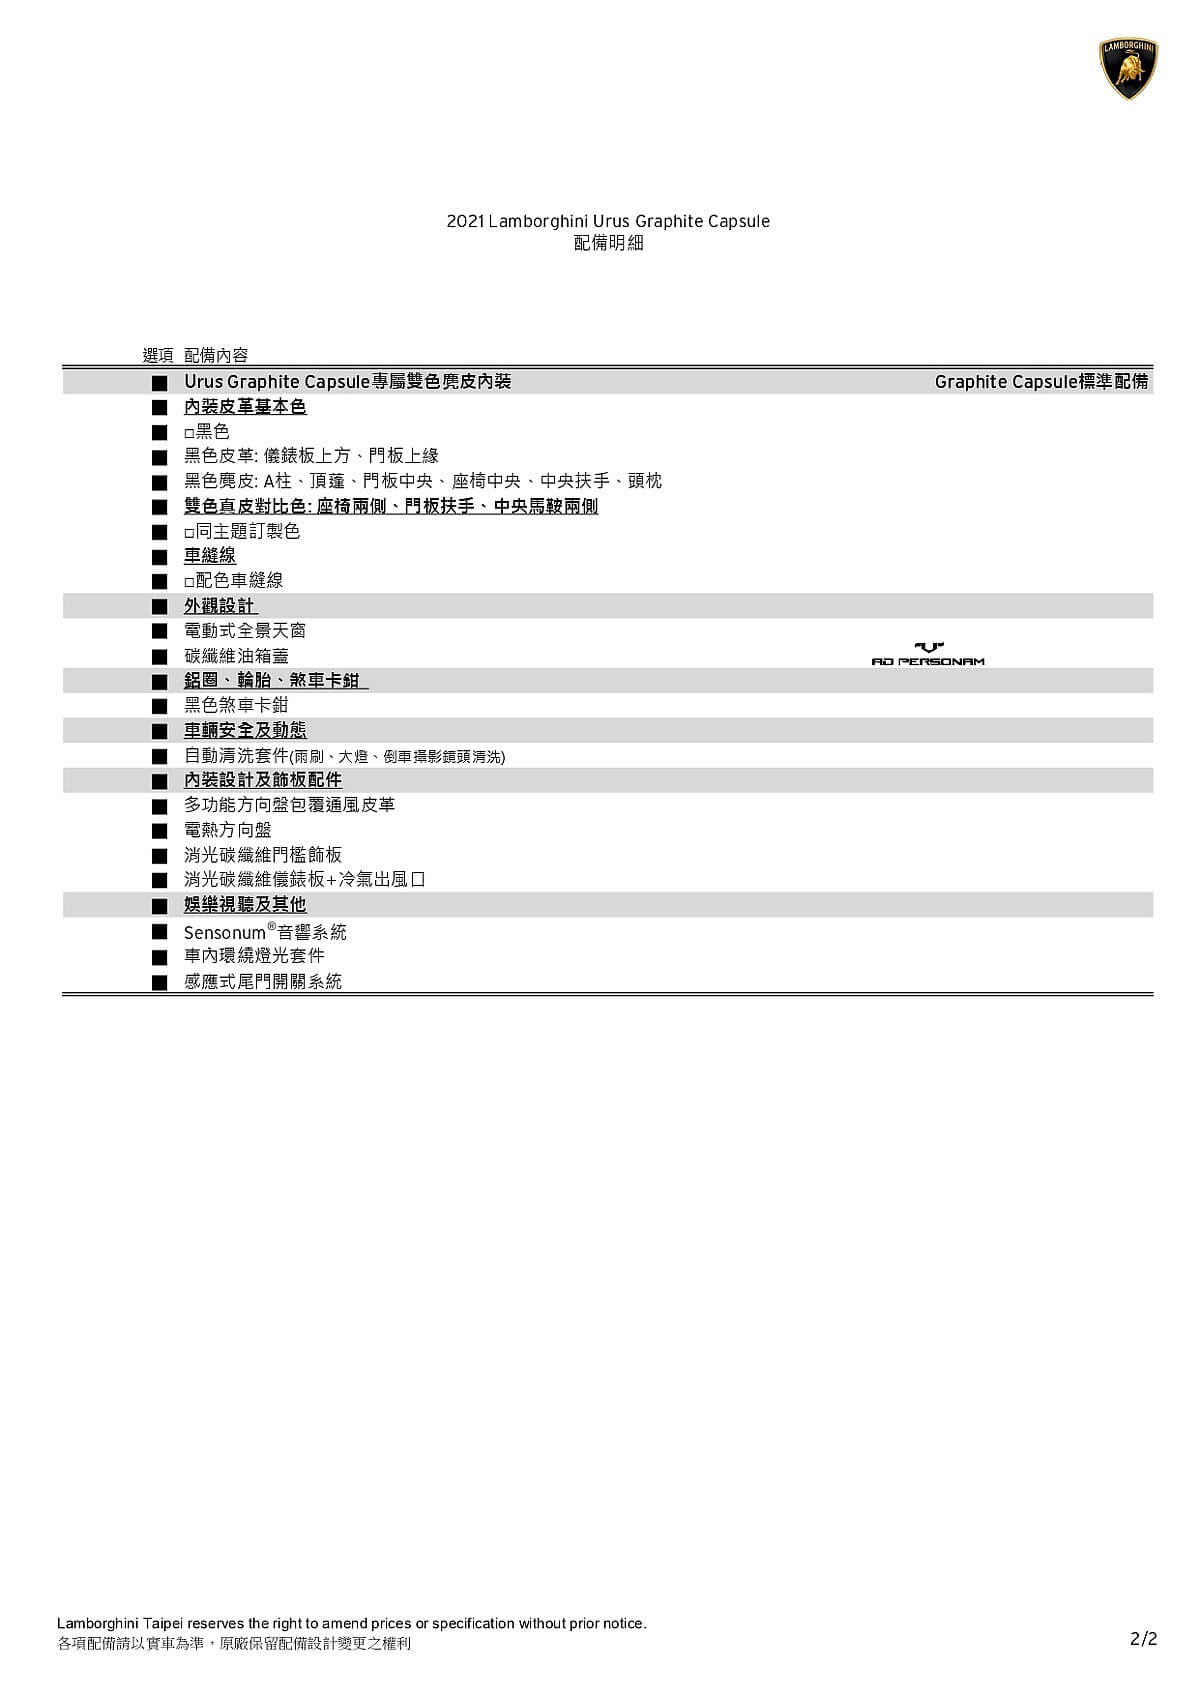 MY21-Urus-Graphite-Capsule-0002.jpg